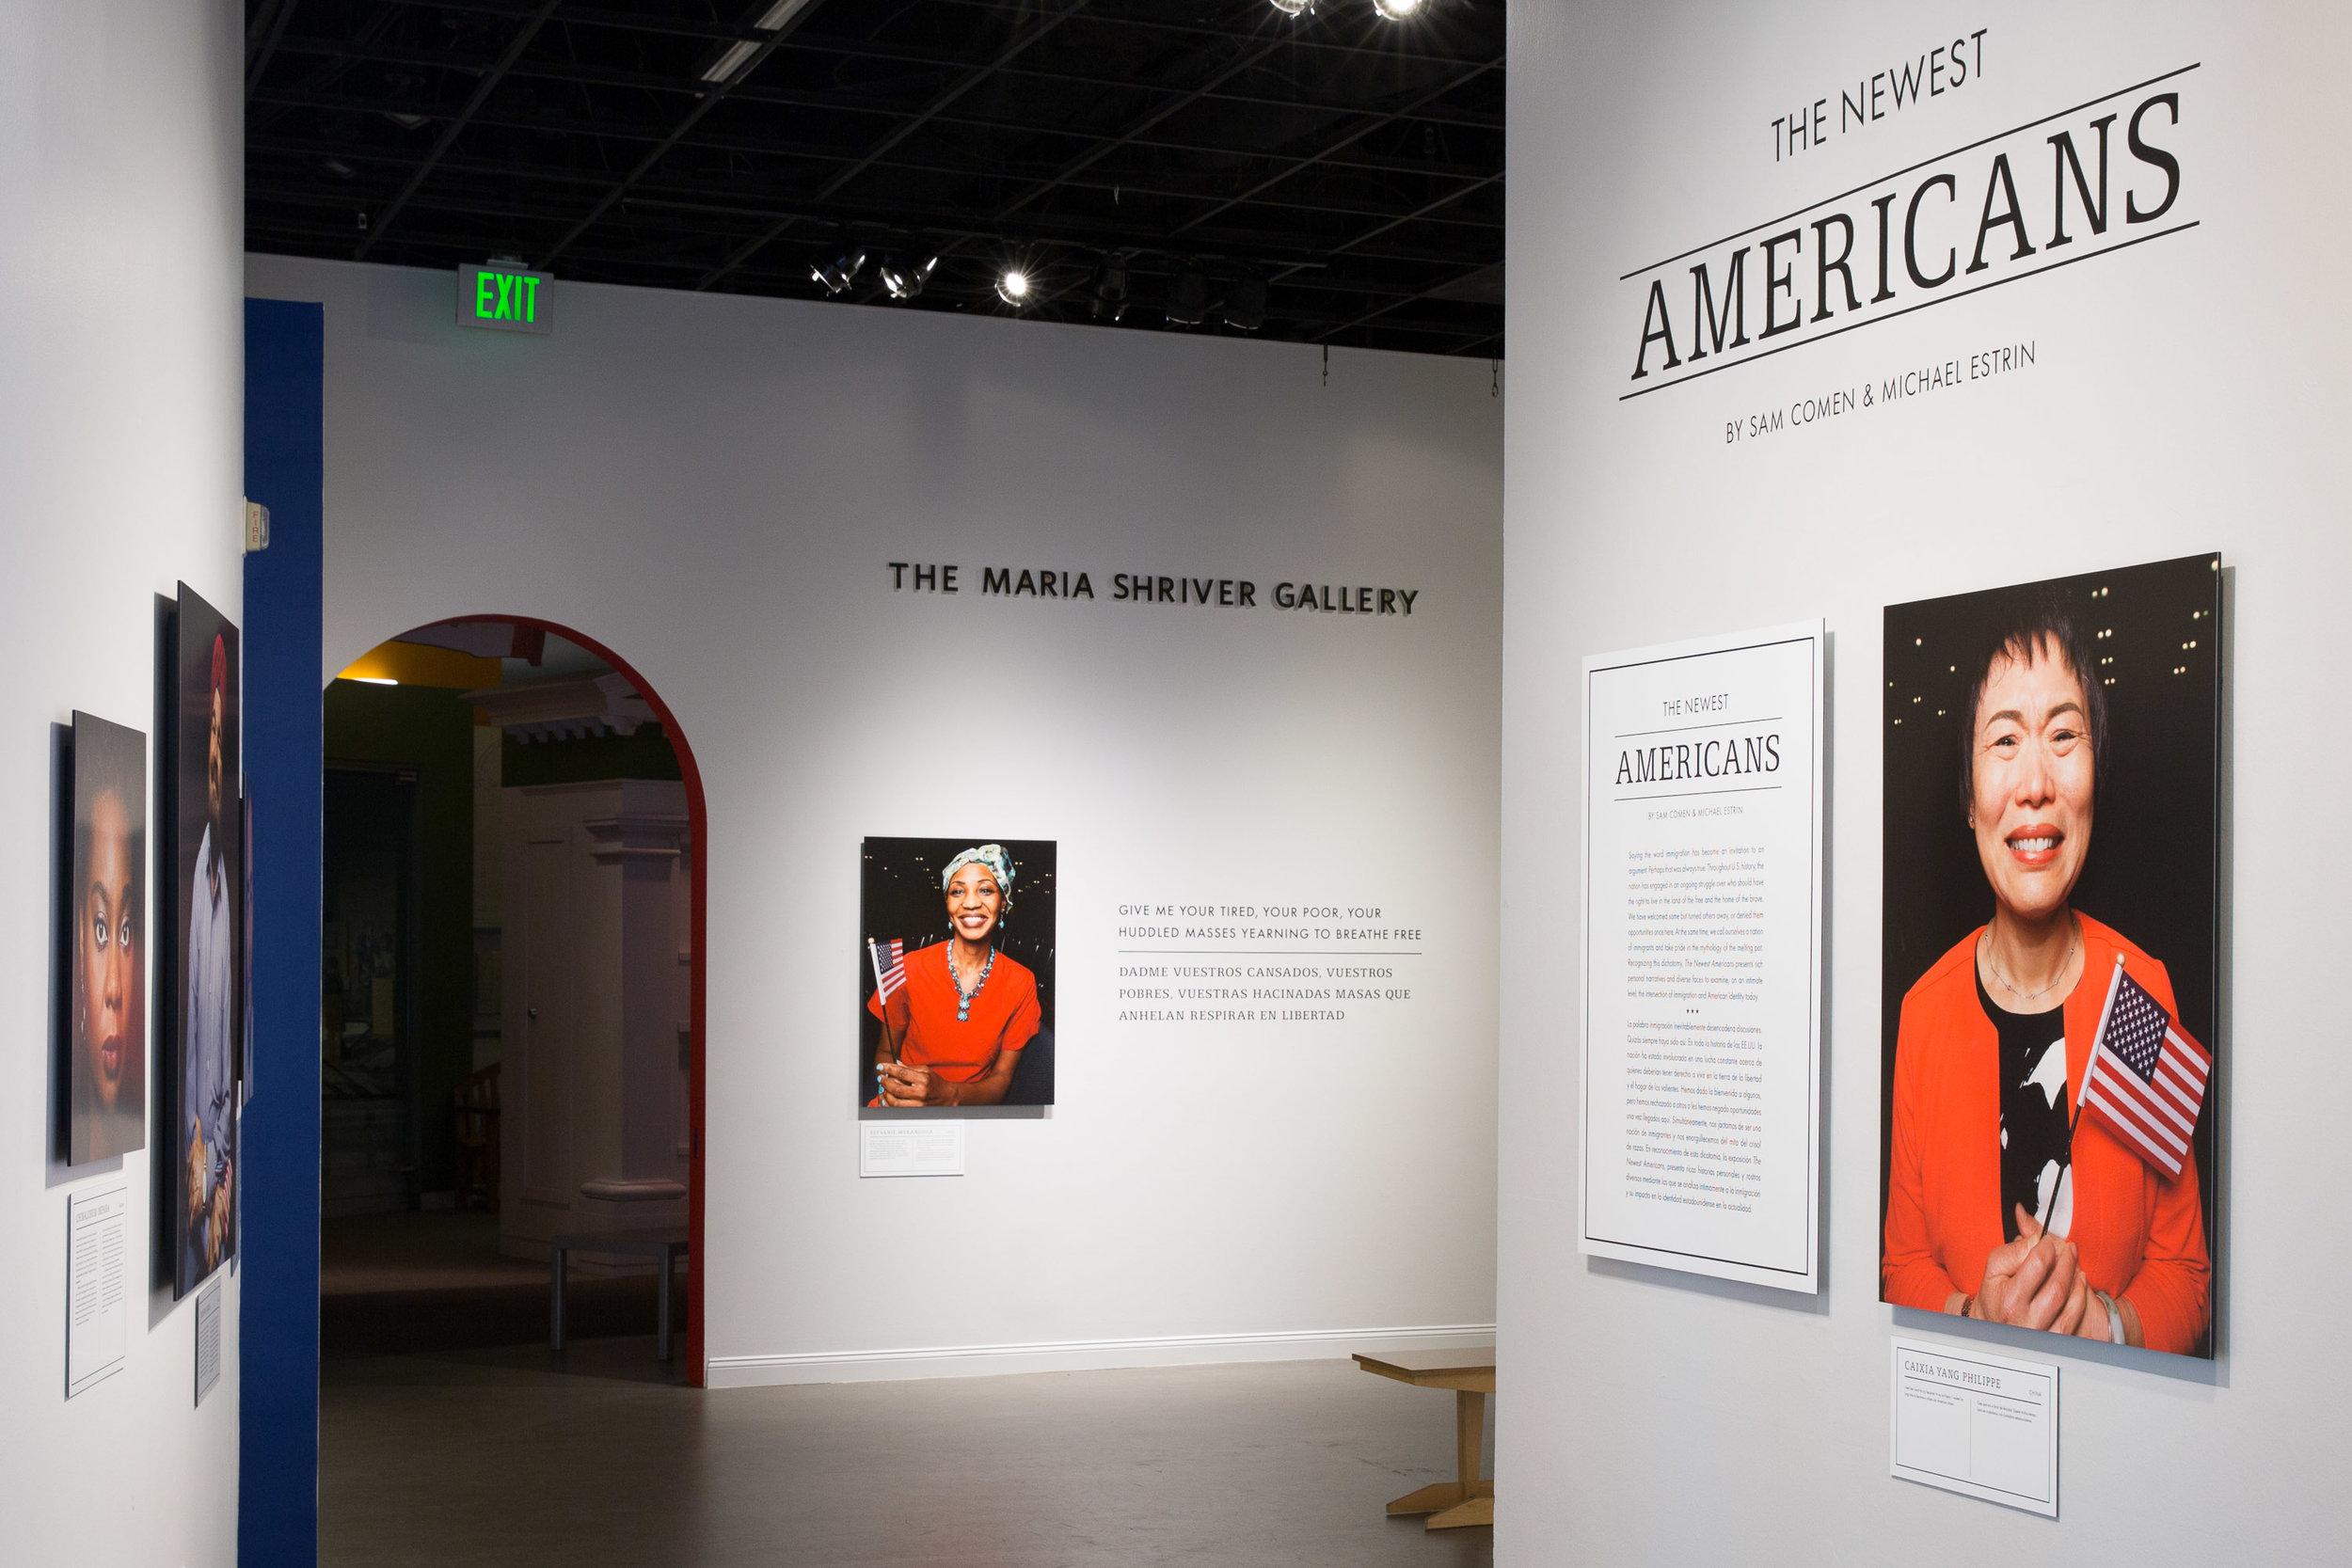 SamComen_NewestAmericans_CAMuseum_113.jpg